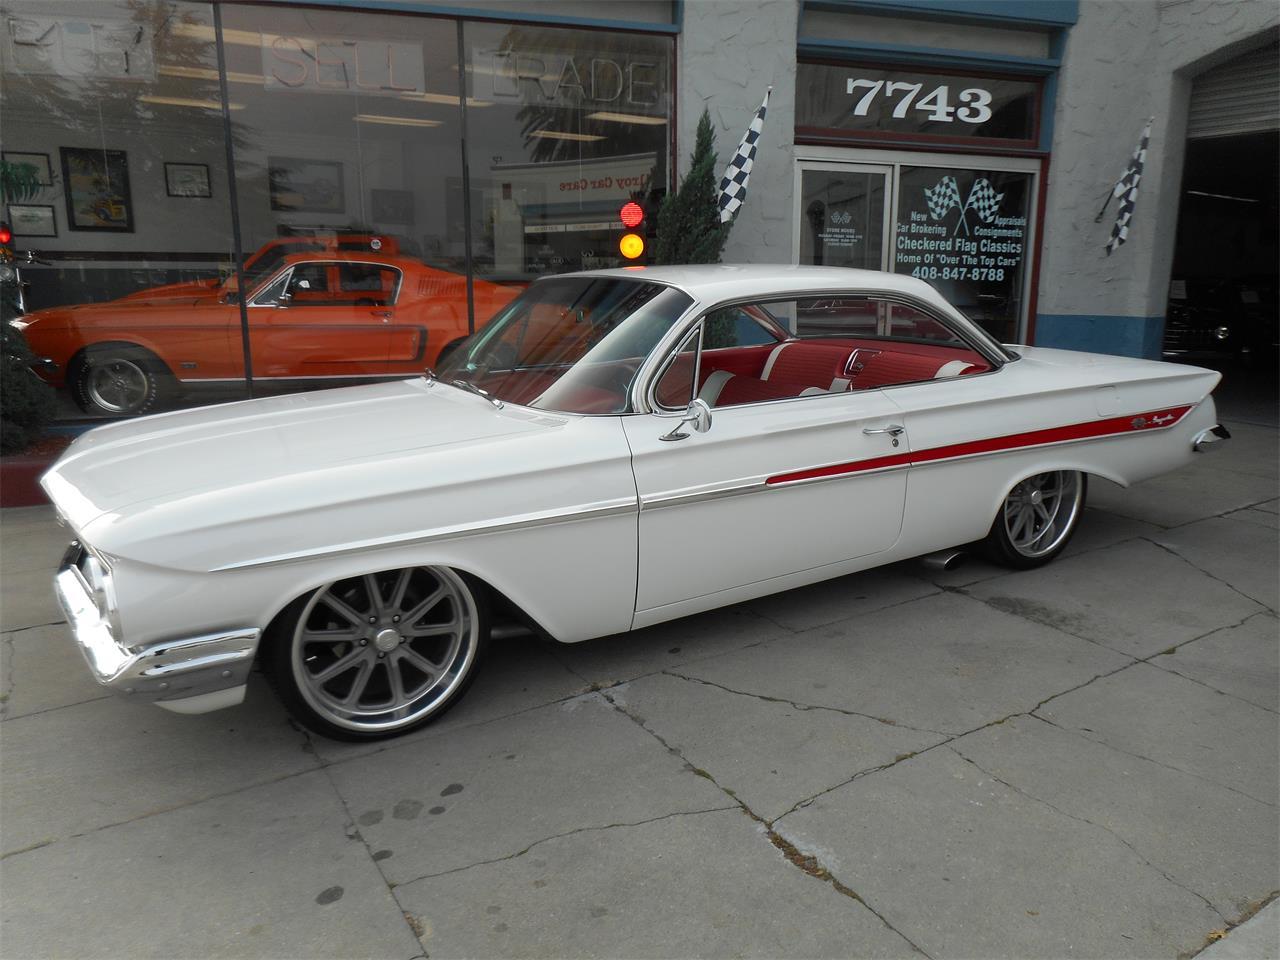 61 Impala For Sale >> 1961 Chevrolet Impala Ss For Sale Classiccars Com Cc 1059186